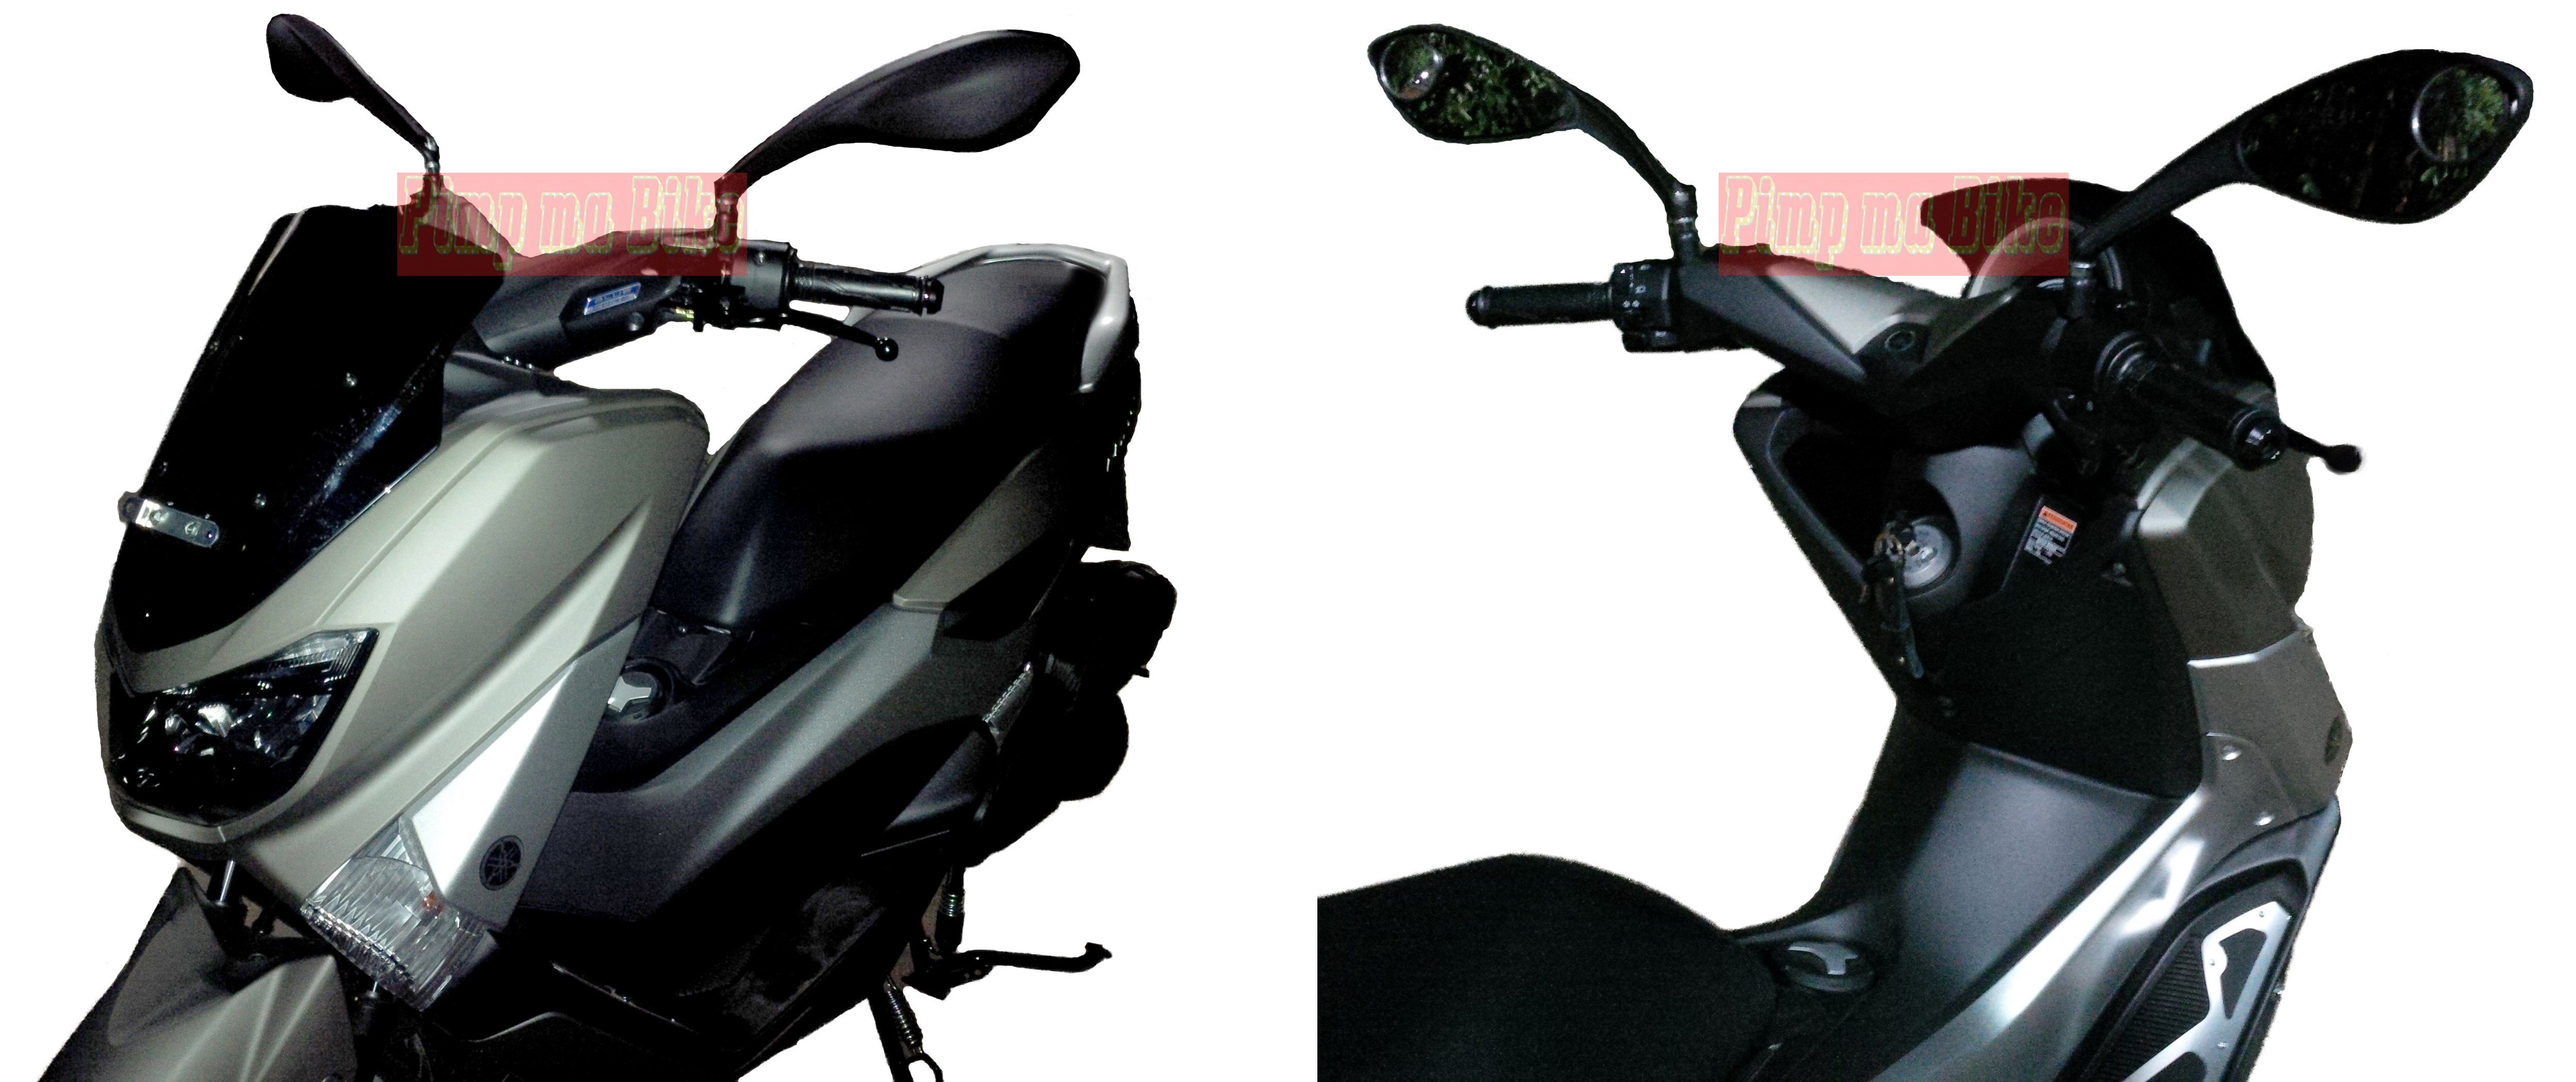 66 Modifikasi Kaca Spion Yamaha Nmax Yamah Mio Aftermarket Ala Ducati Monster Untuk Moge Naked Bike Dan